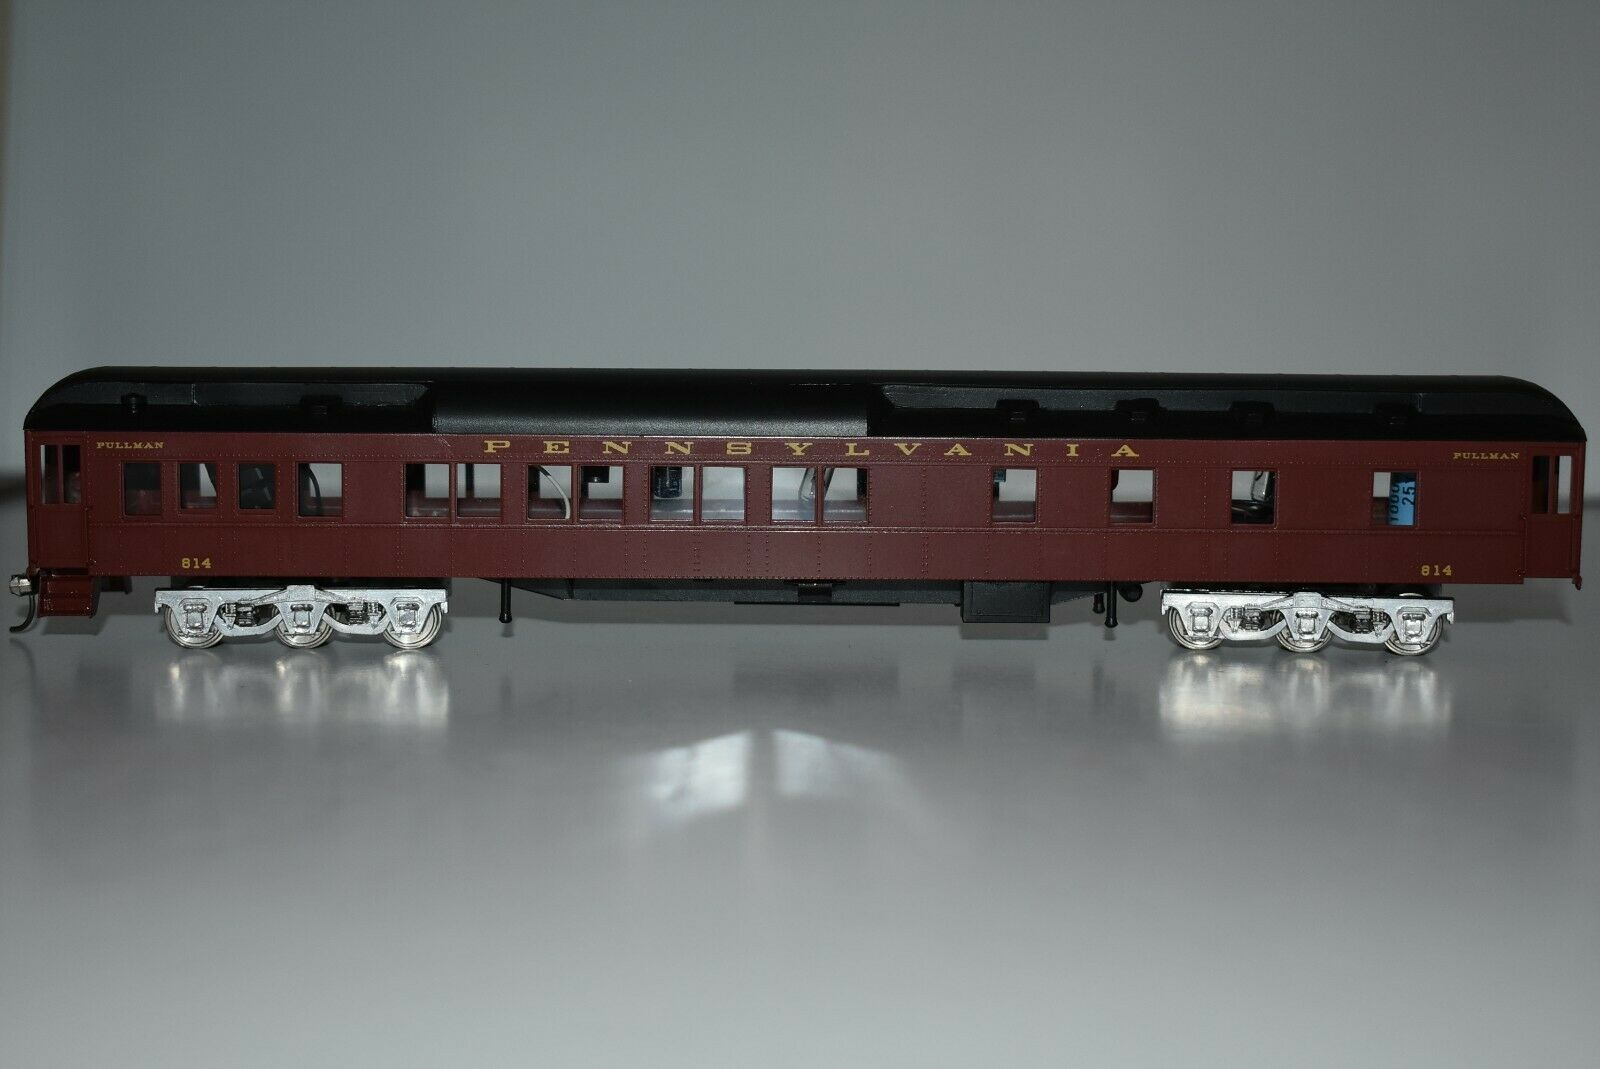 HO Scale Brass Lambert 814 Pennsylvania Pullman Passenger voiture J9654